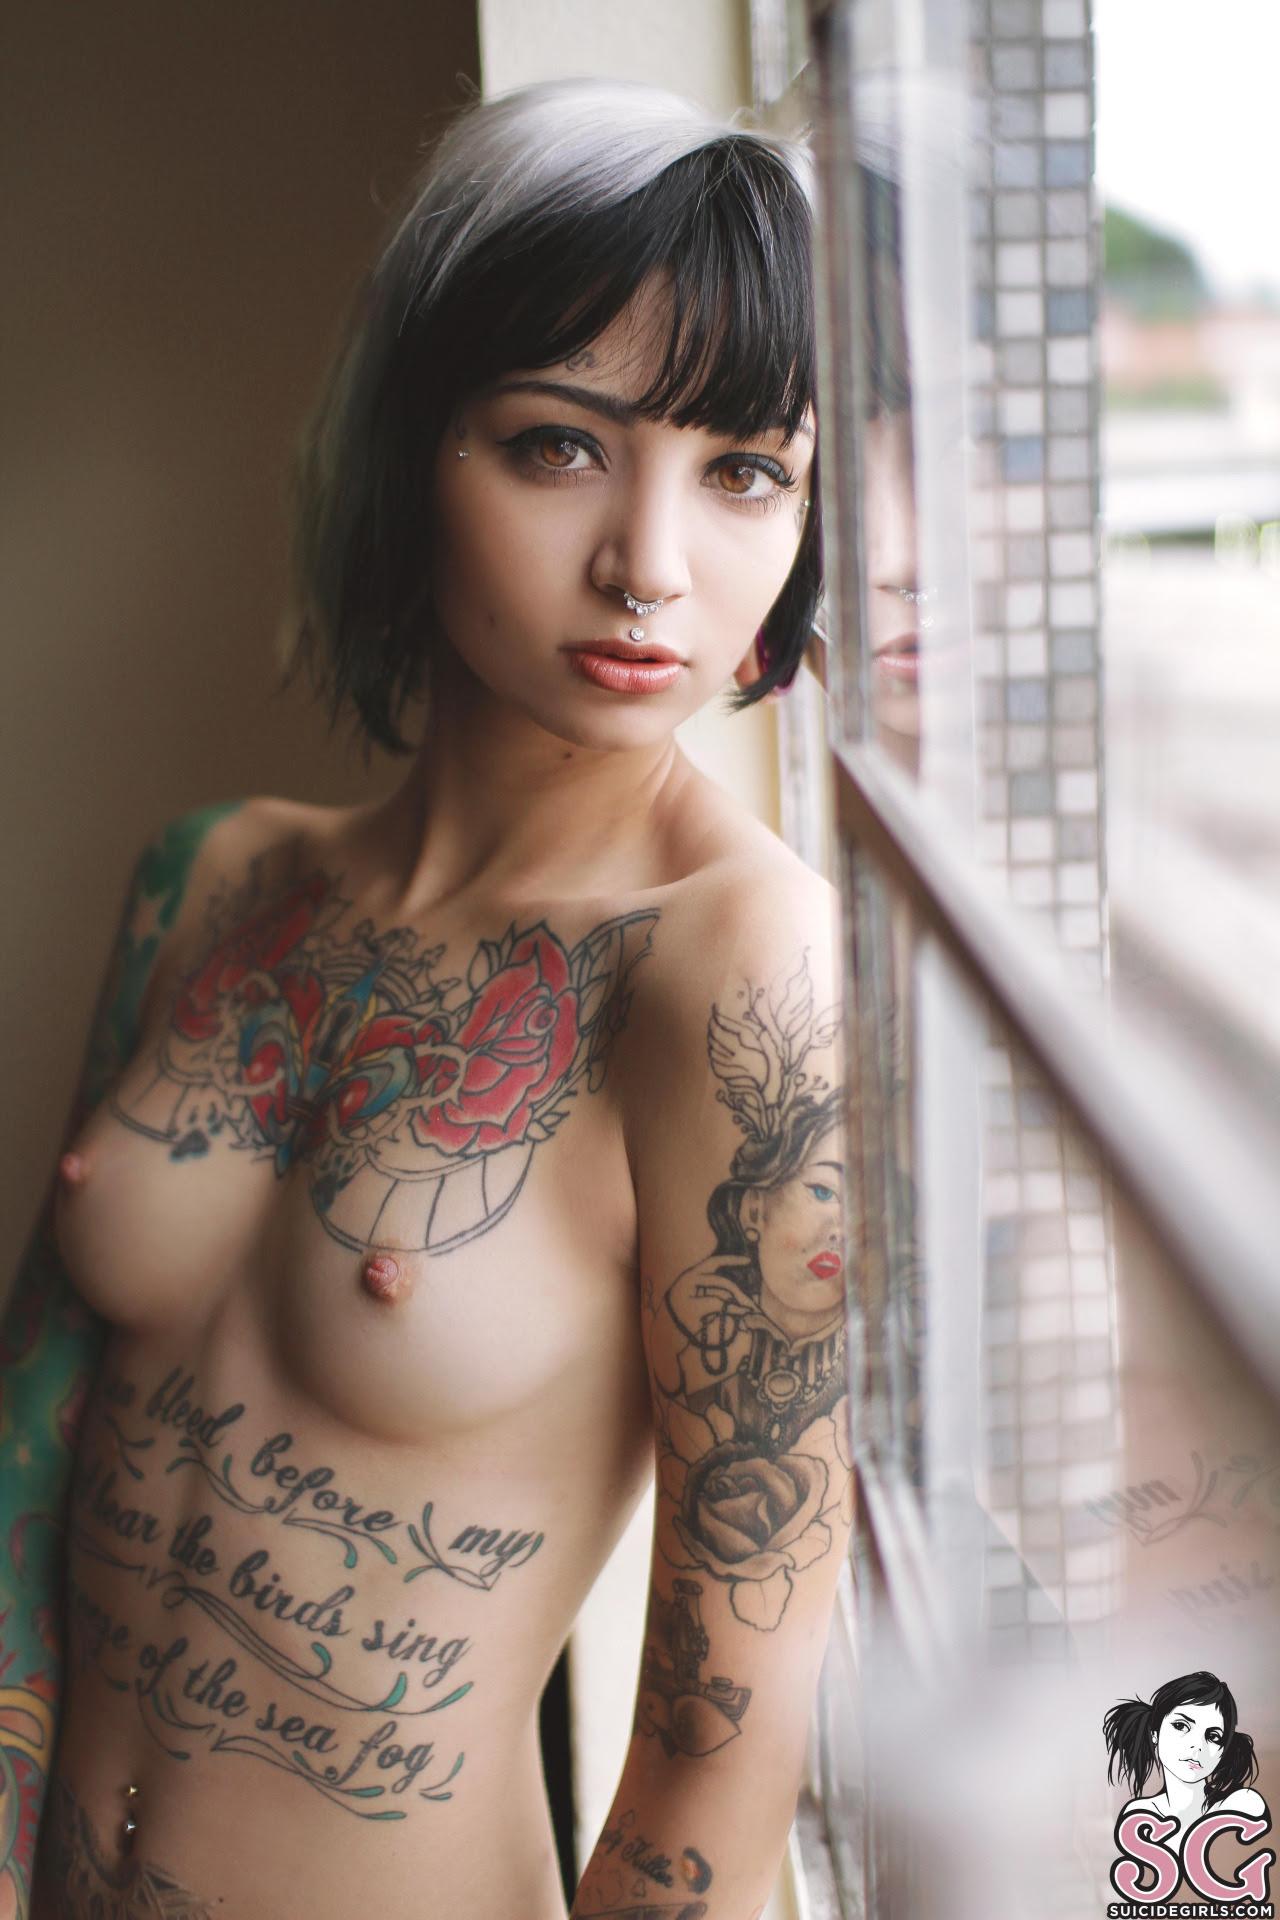 suicide-girls-tatuaze-kobiety-nago-vol6-49